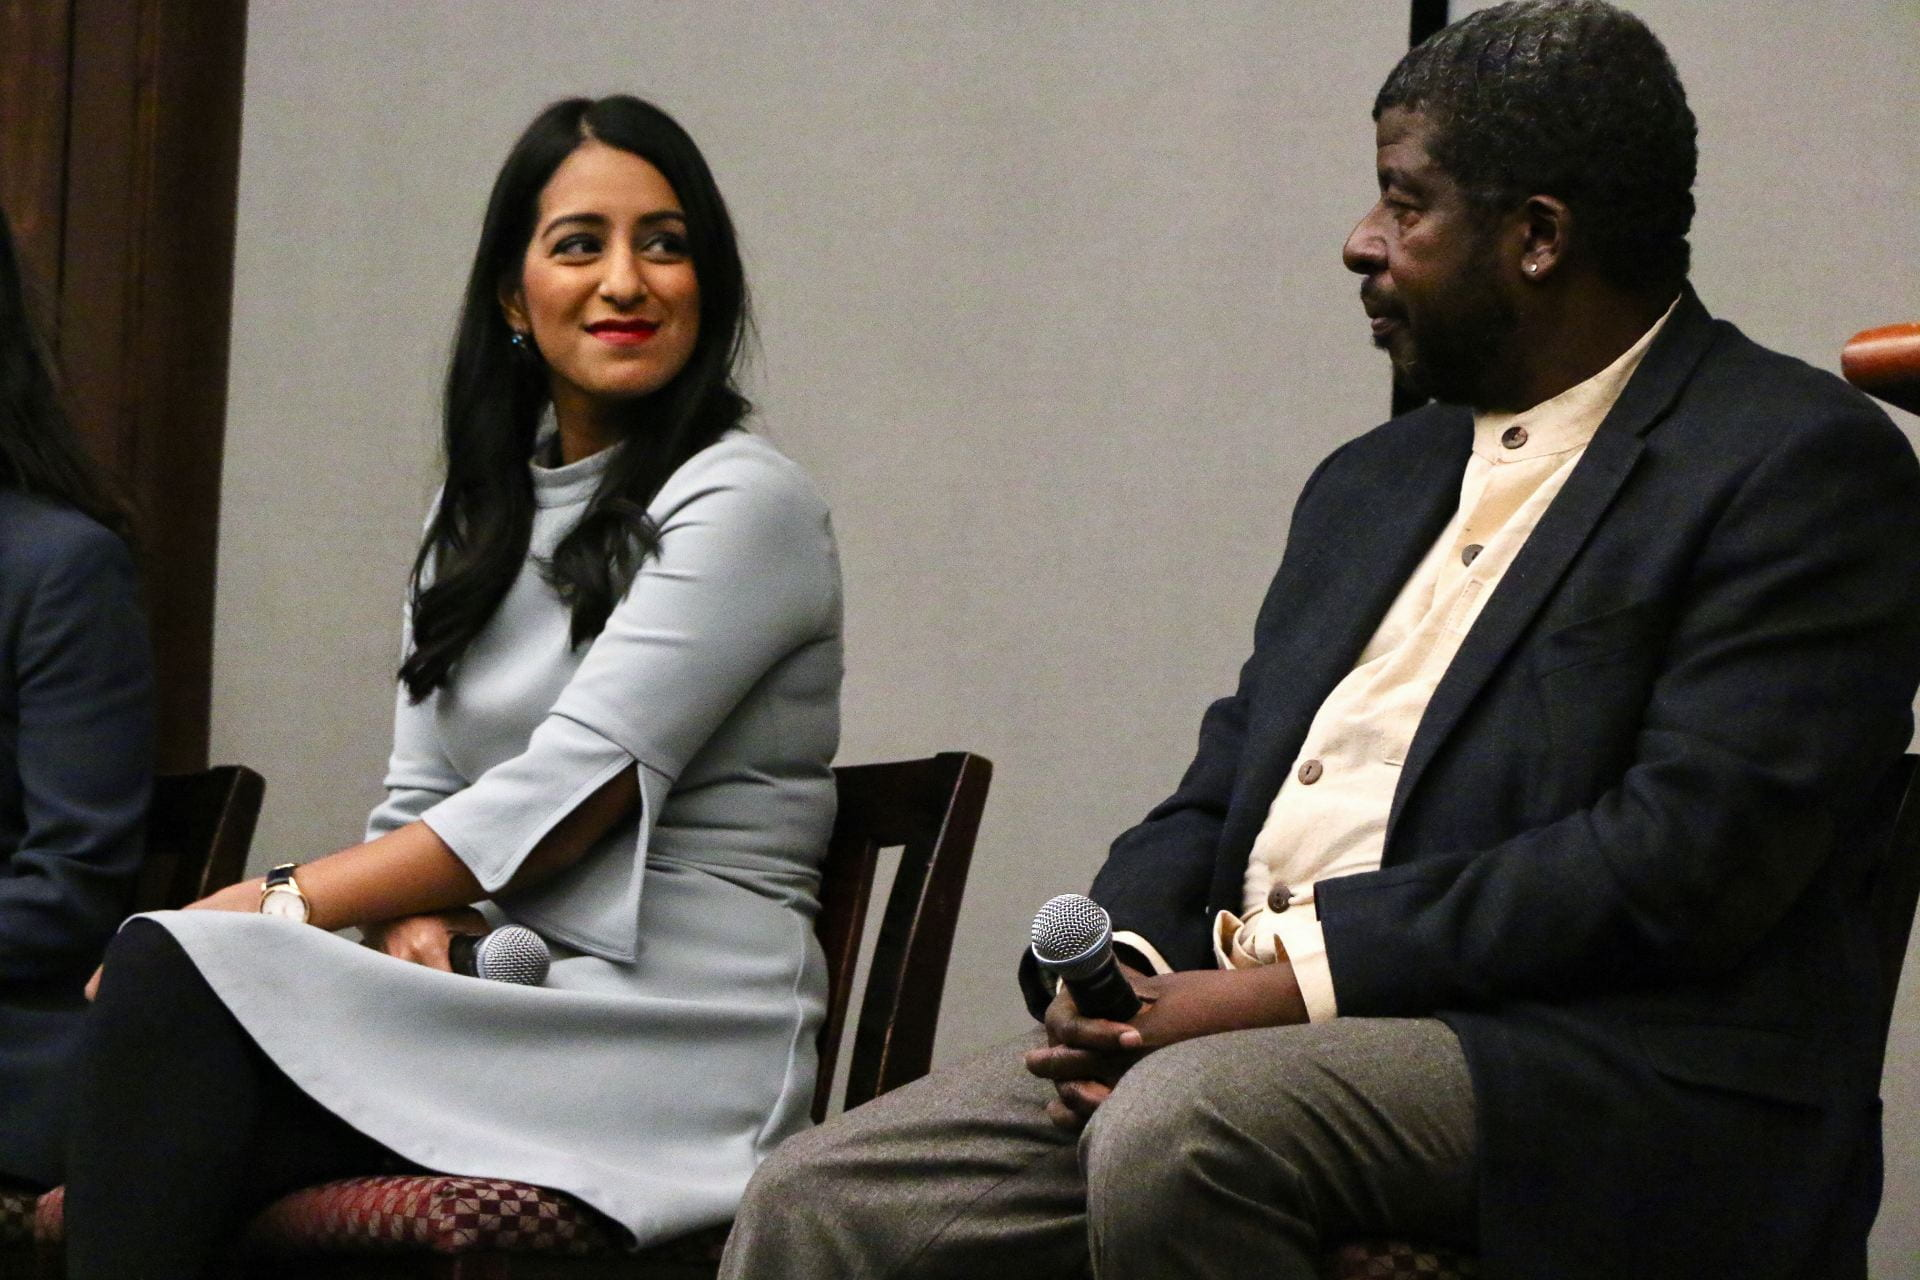 The Guardian political reporter Sabrina Siddiqui and visiting professor Steve Holmes, Nov. 2018